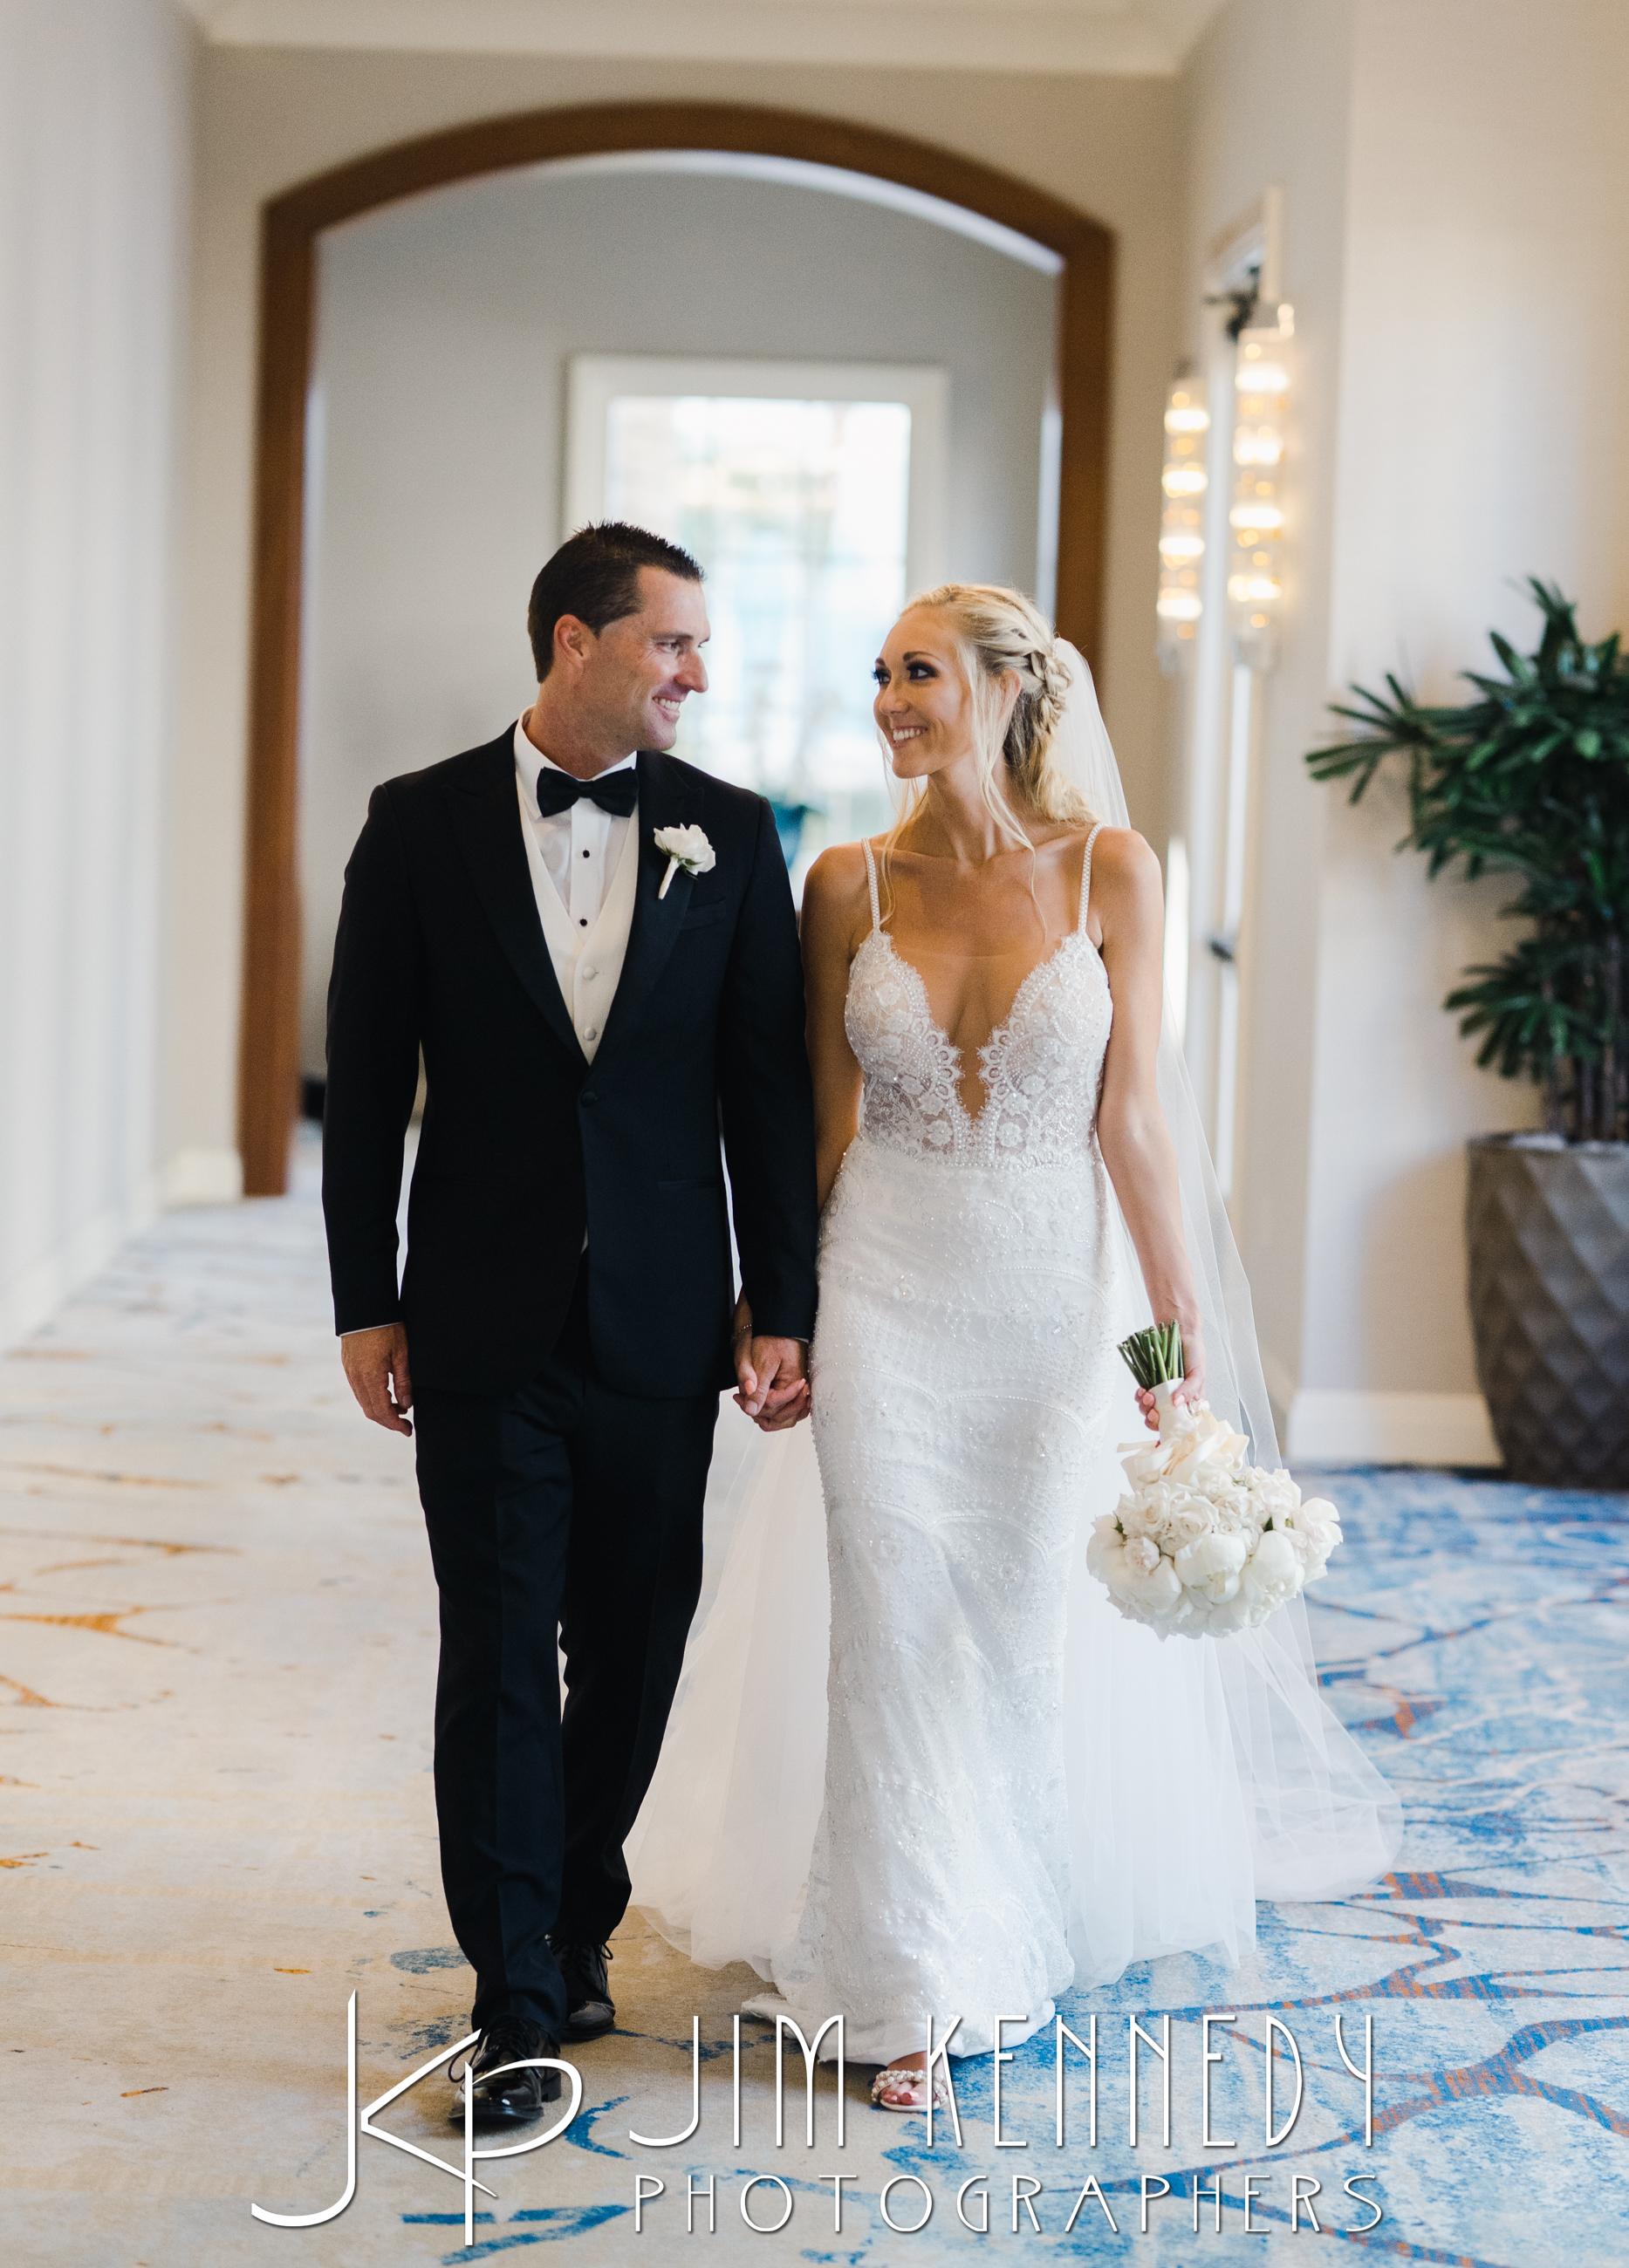 balboa-bay-resort-wedding-brooke-kevin_0147.JPG